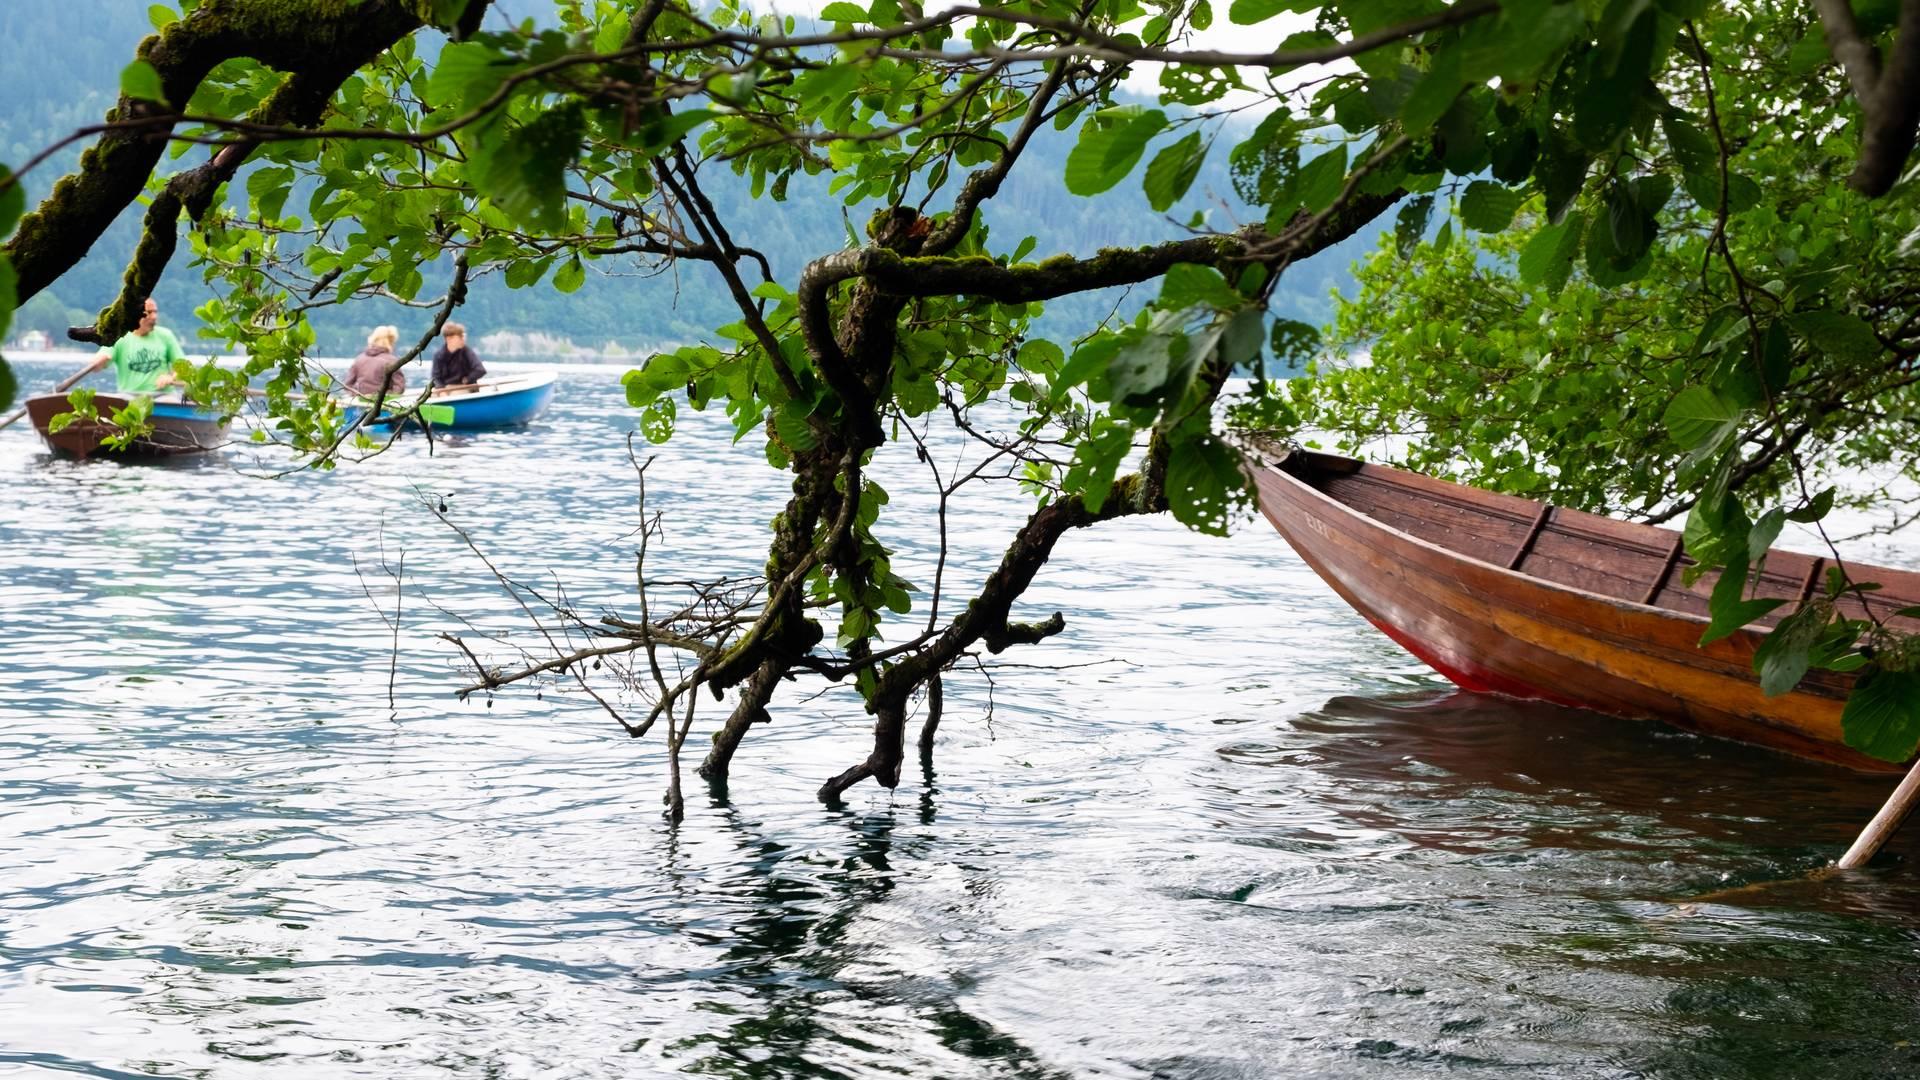 <p>Urlaub zu zweit am Millstätter See, Biwak am Campingplatz; Sabrina Schütt, Buchtenwandern</p>